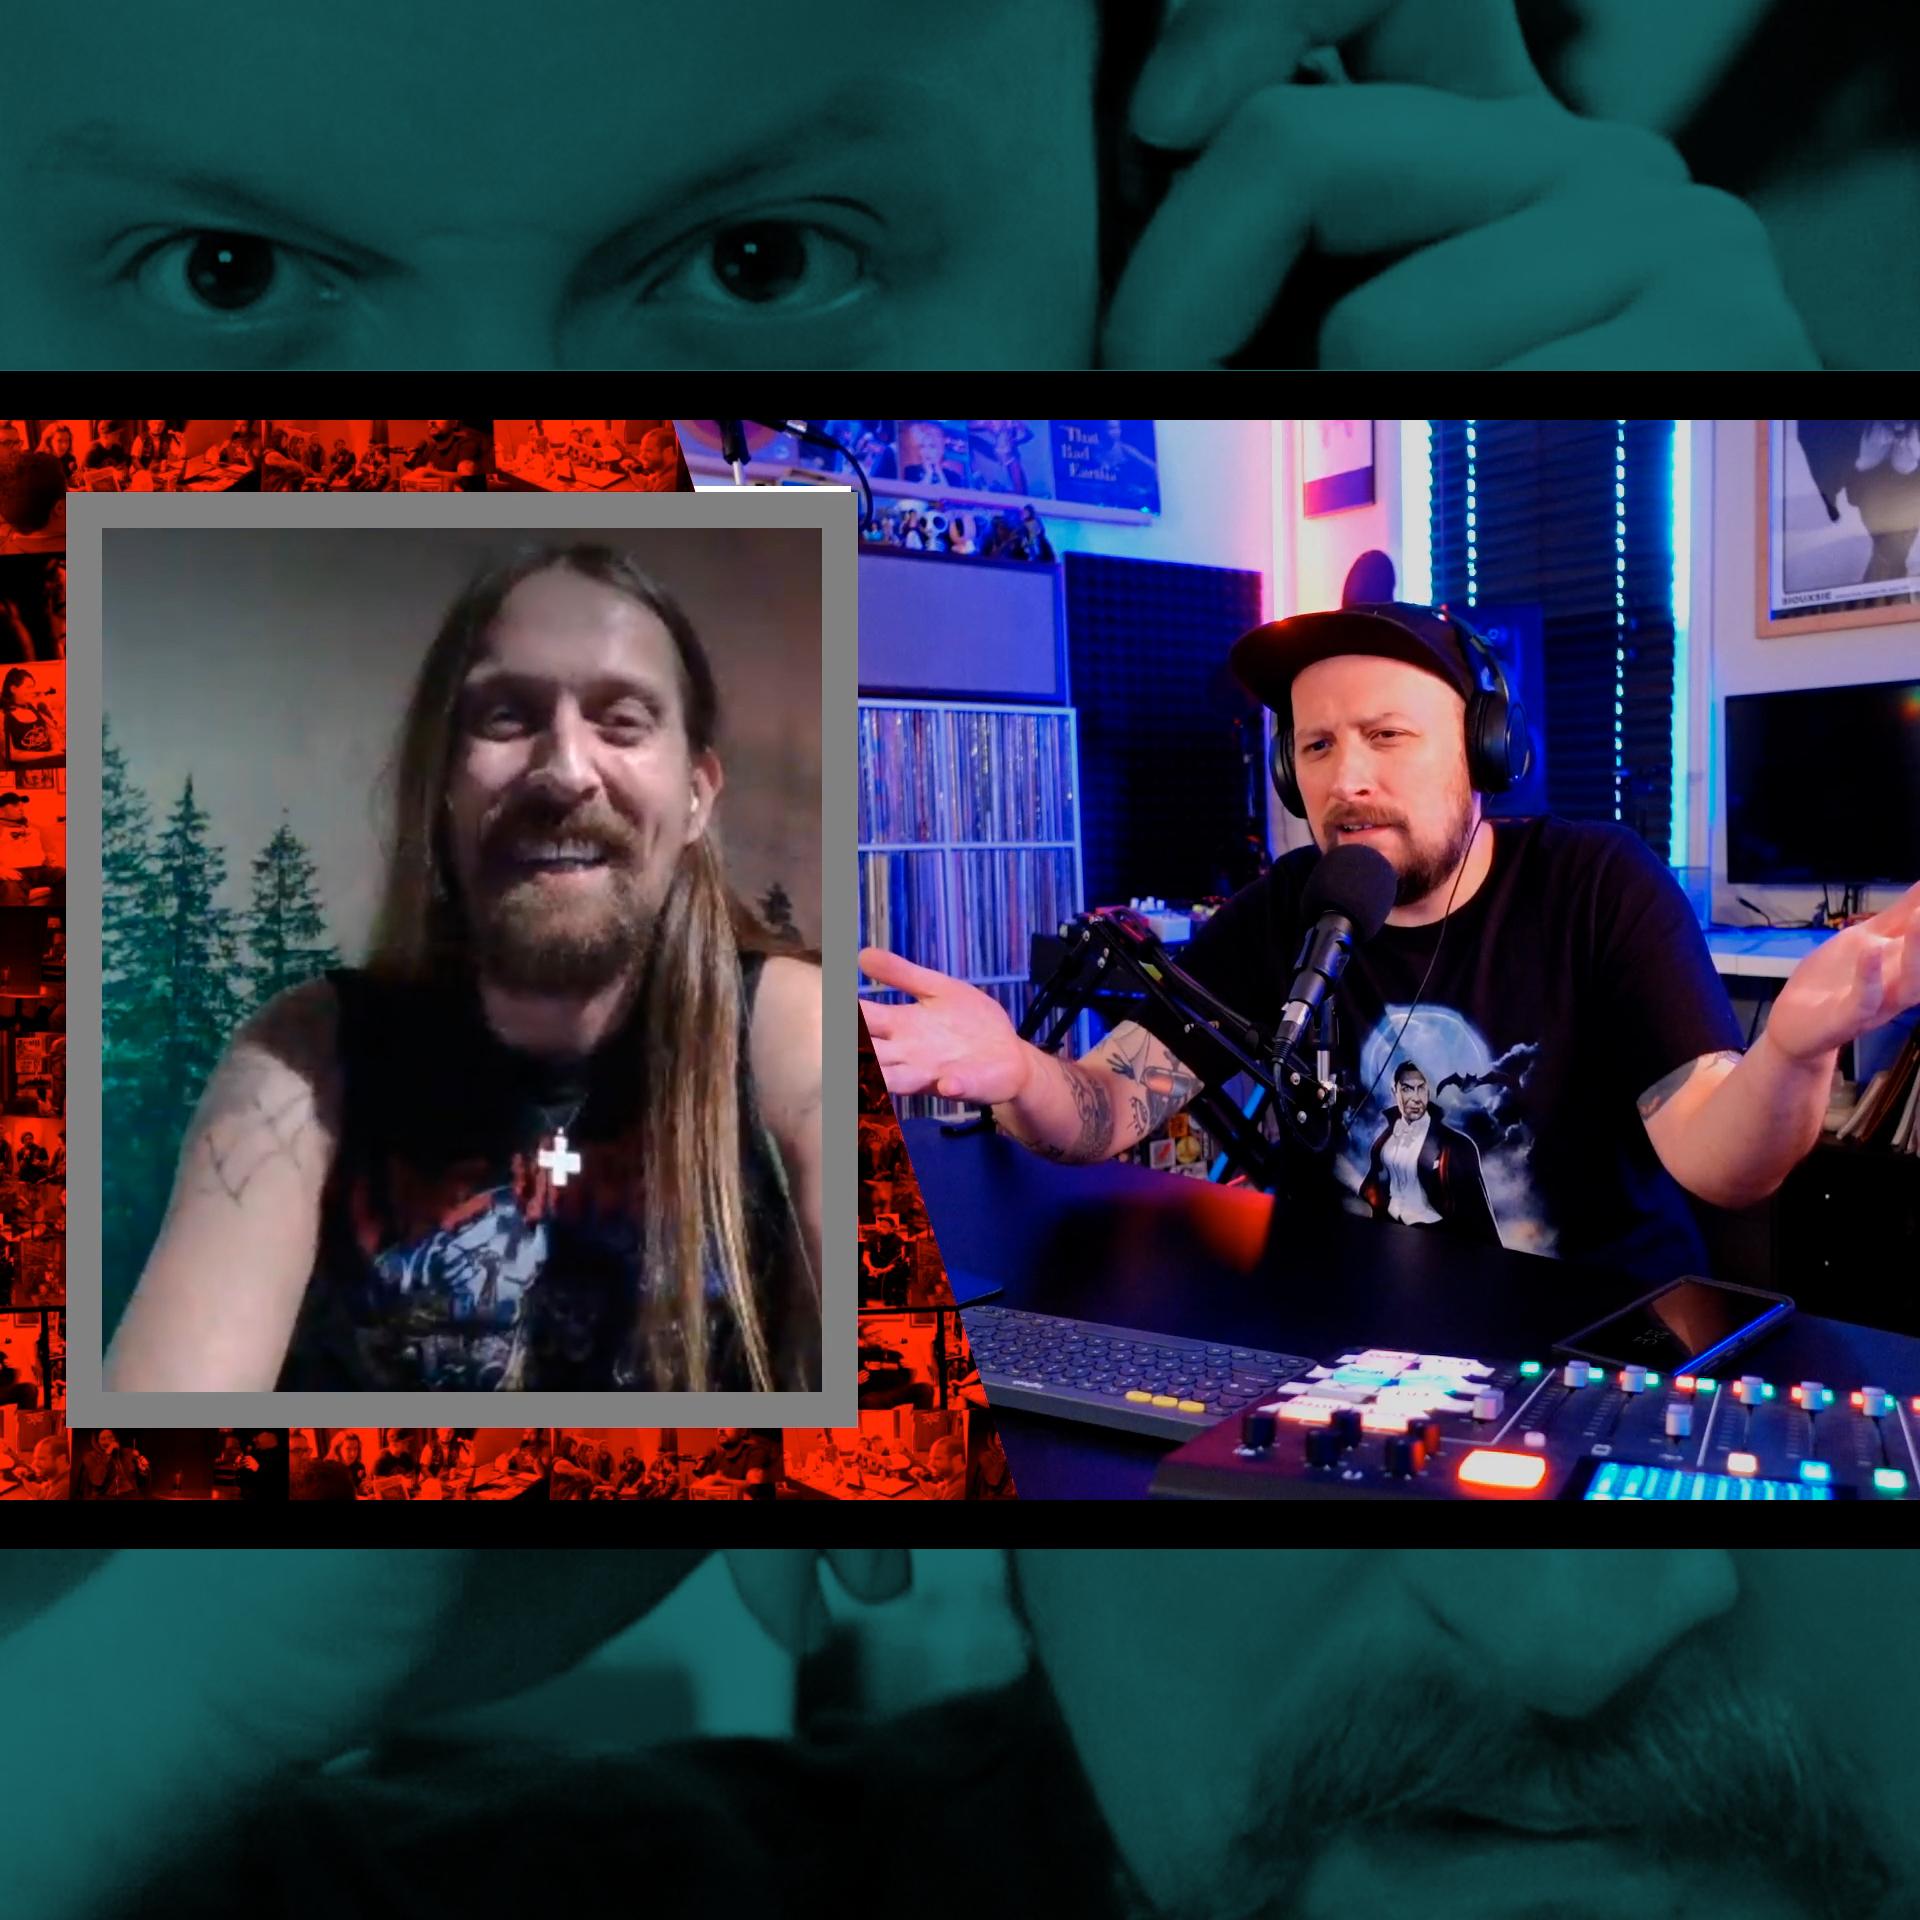 Svartalv Halvorsen (S A Destroyer) | Start The Beat Podcast (Episode 368) show art